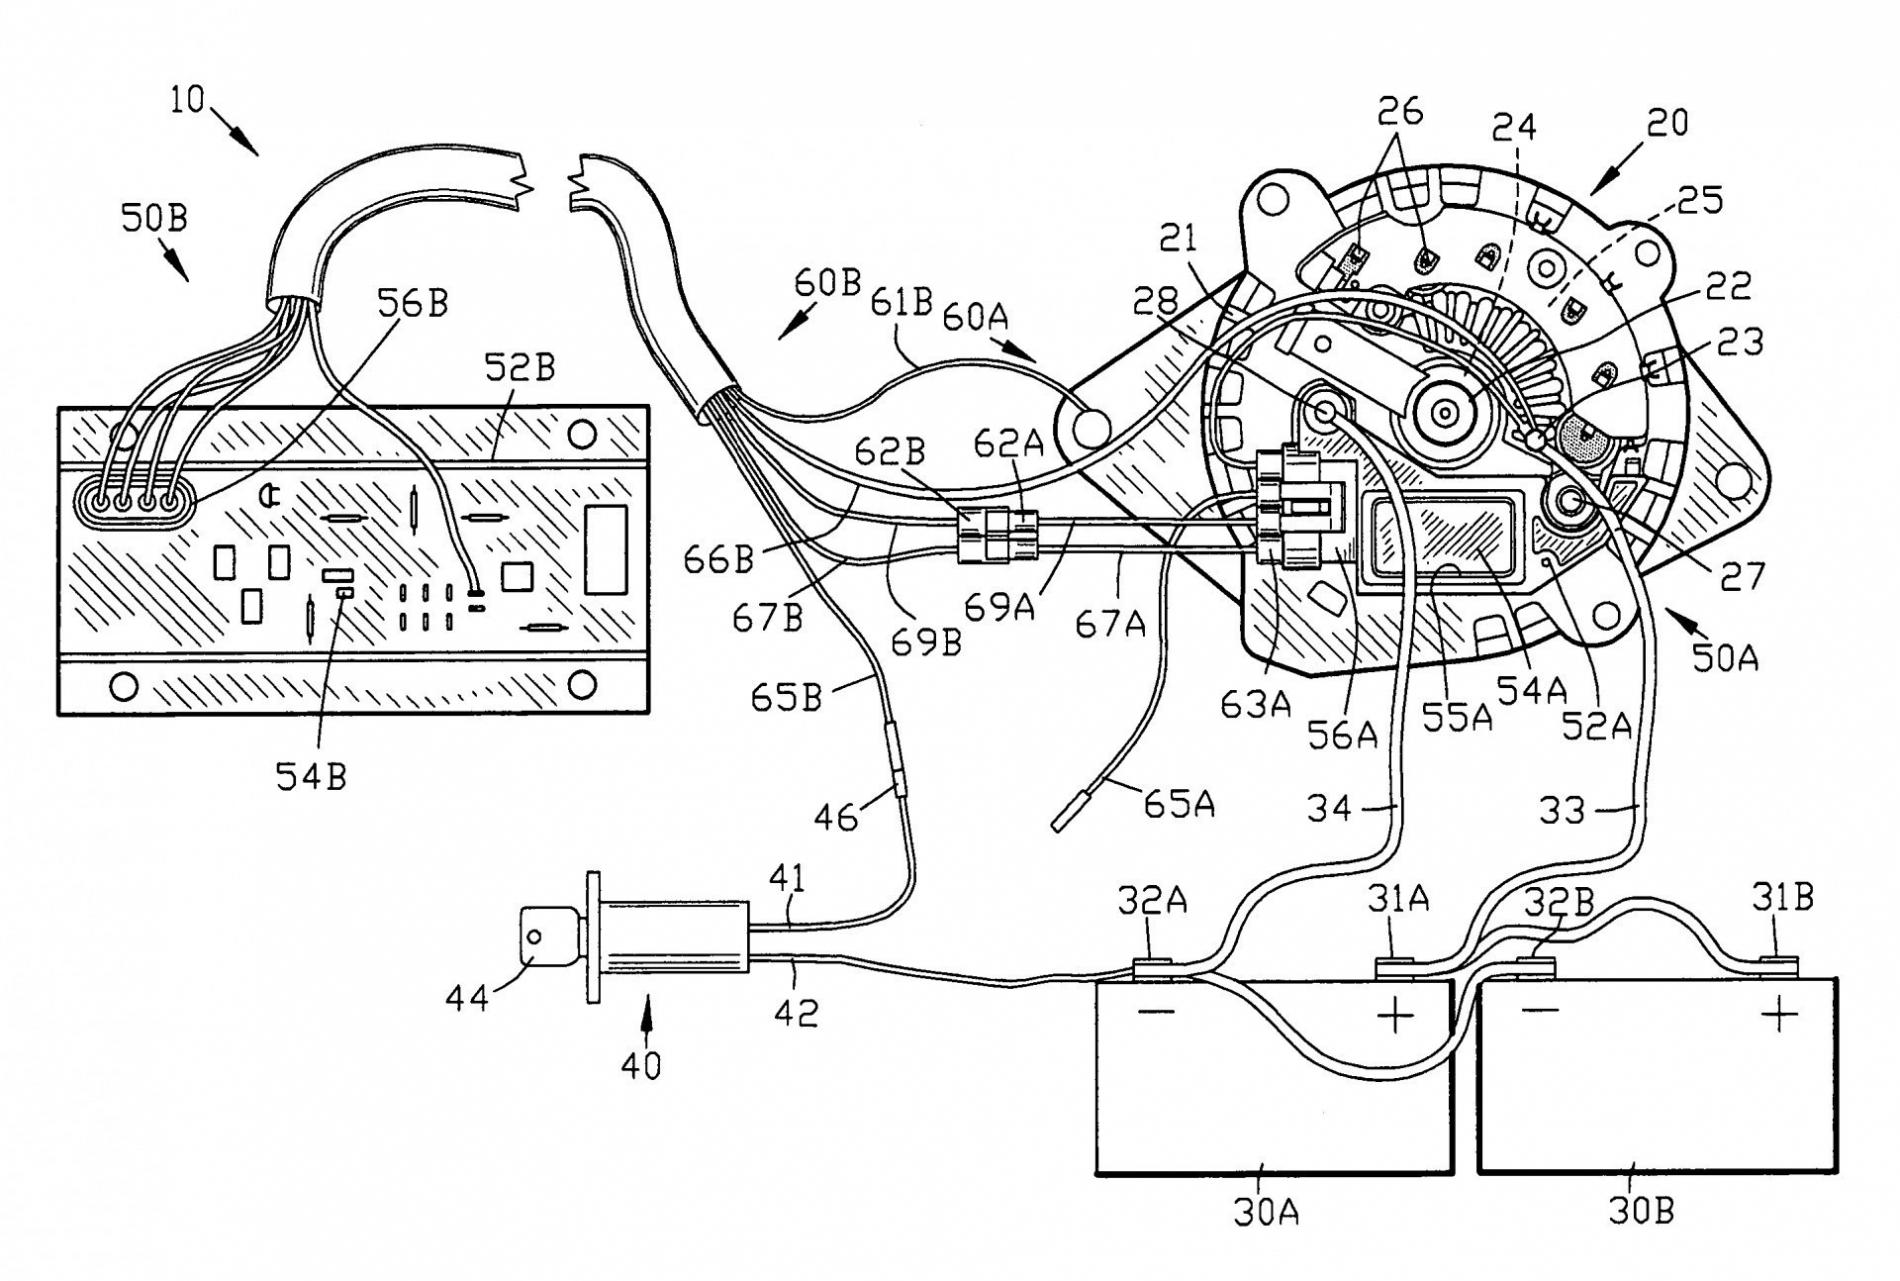 Ford Alternator External Regulator Wiring Diagram   Wiring Diagram - Ford Alternator Wiring Diagram Internal Regulator